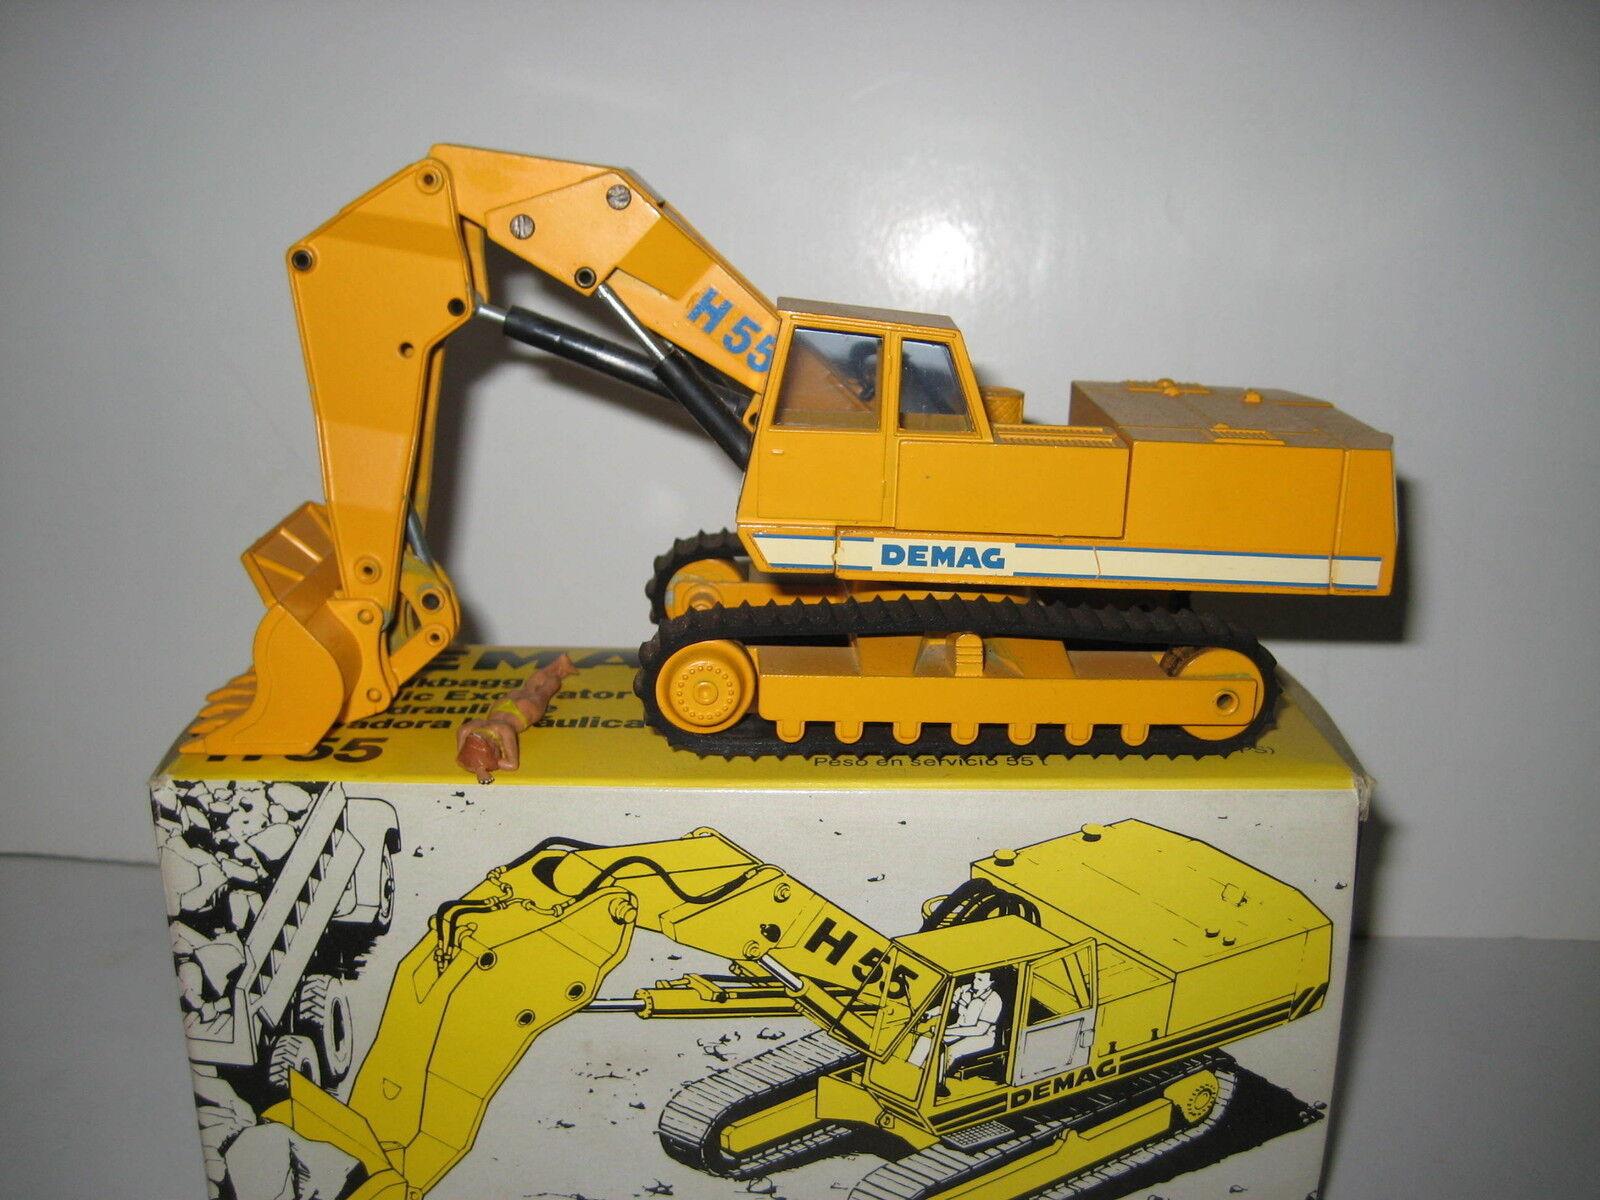 DEMAG H 55 Excavateurs hochlöffel vers à soie  113.6 NZG 1 50 neuf dans sa boîte